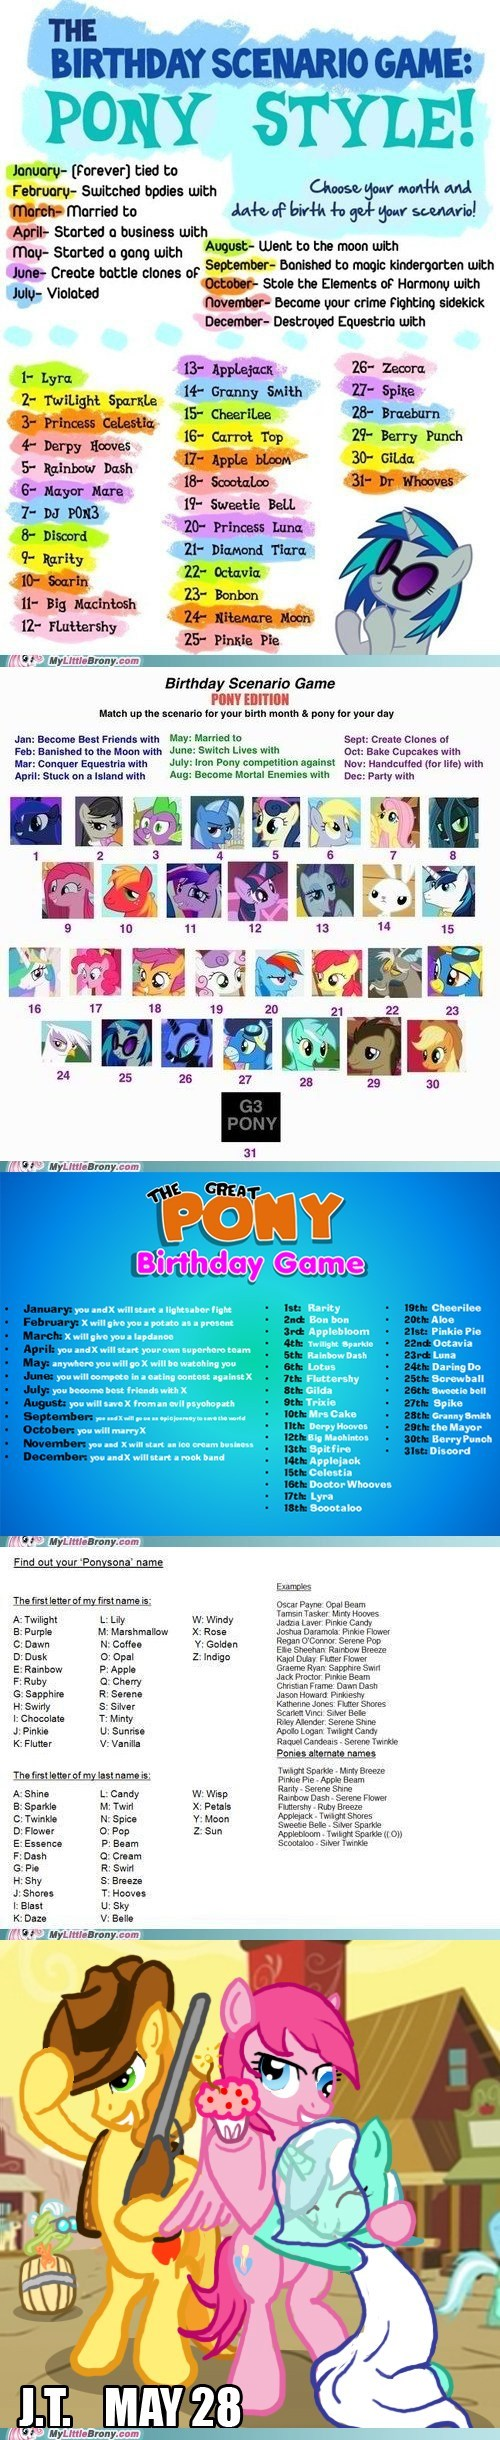 birthday scenario game meme the internets - 6492941824